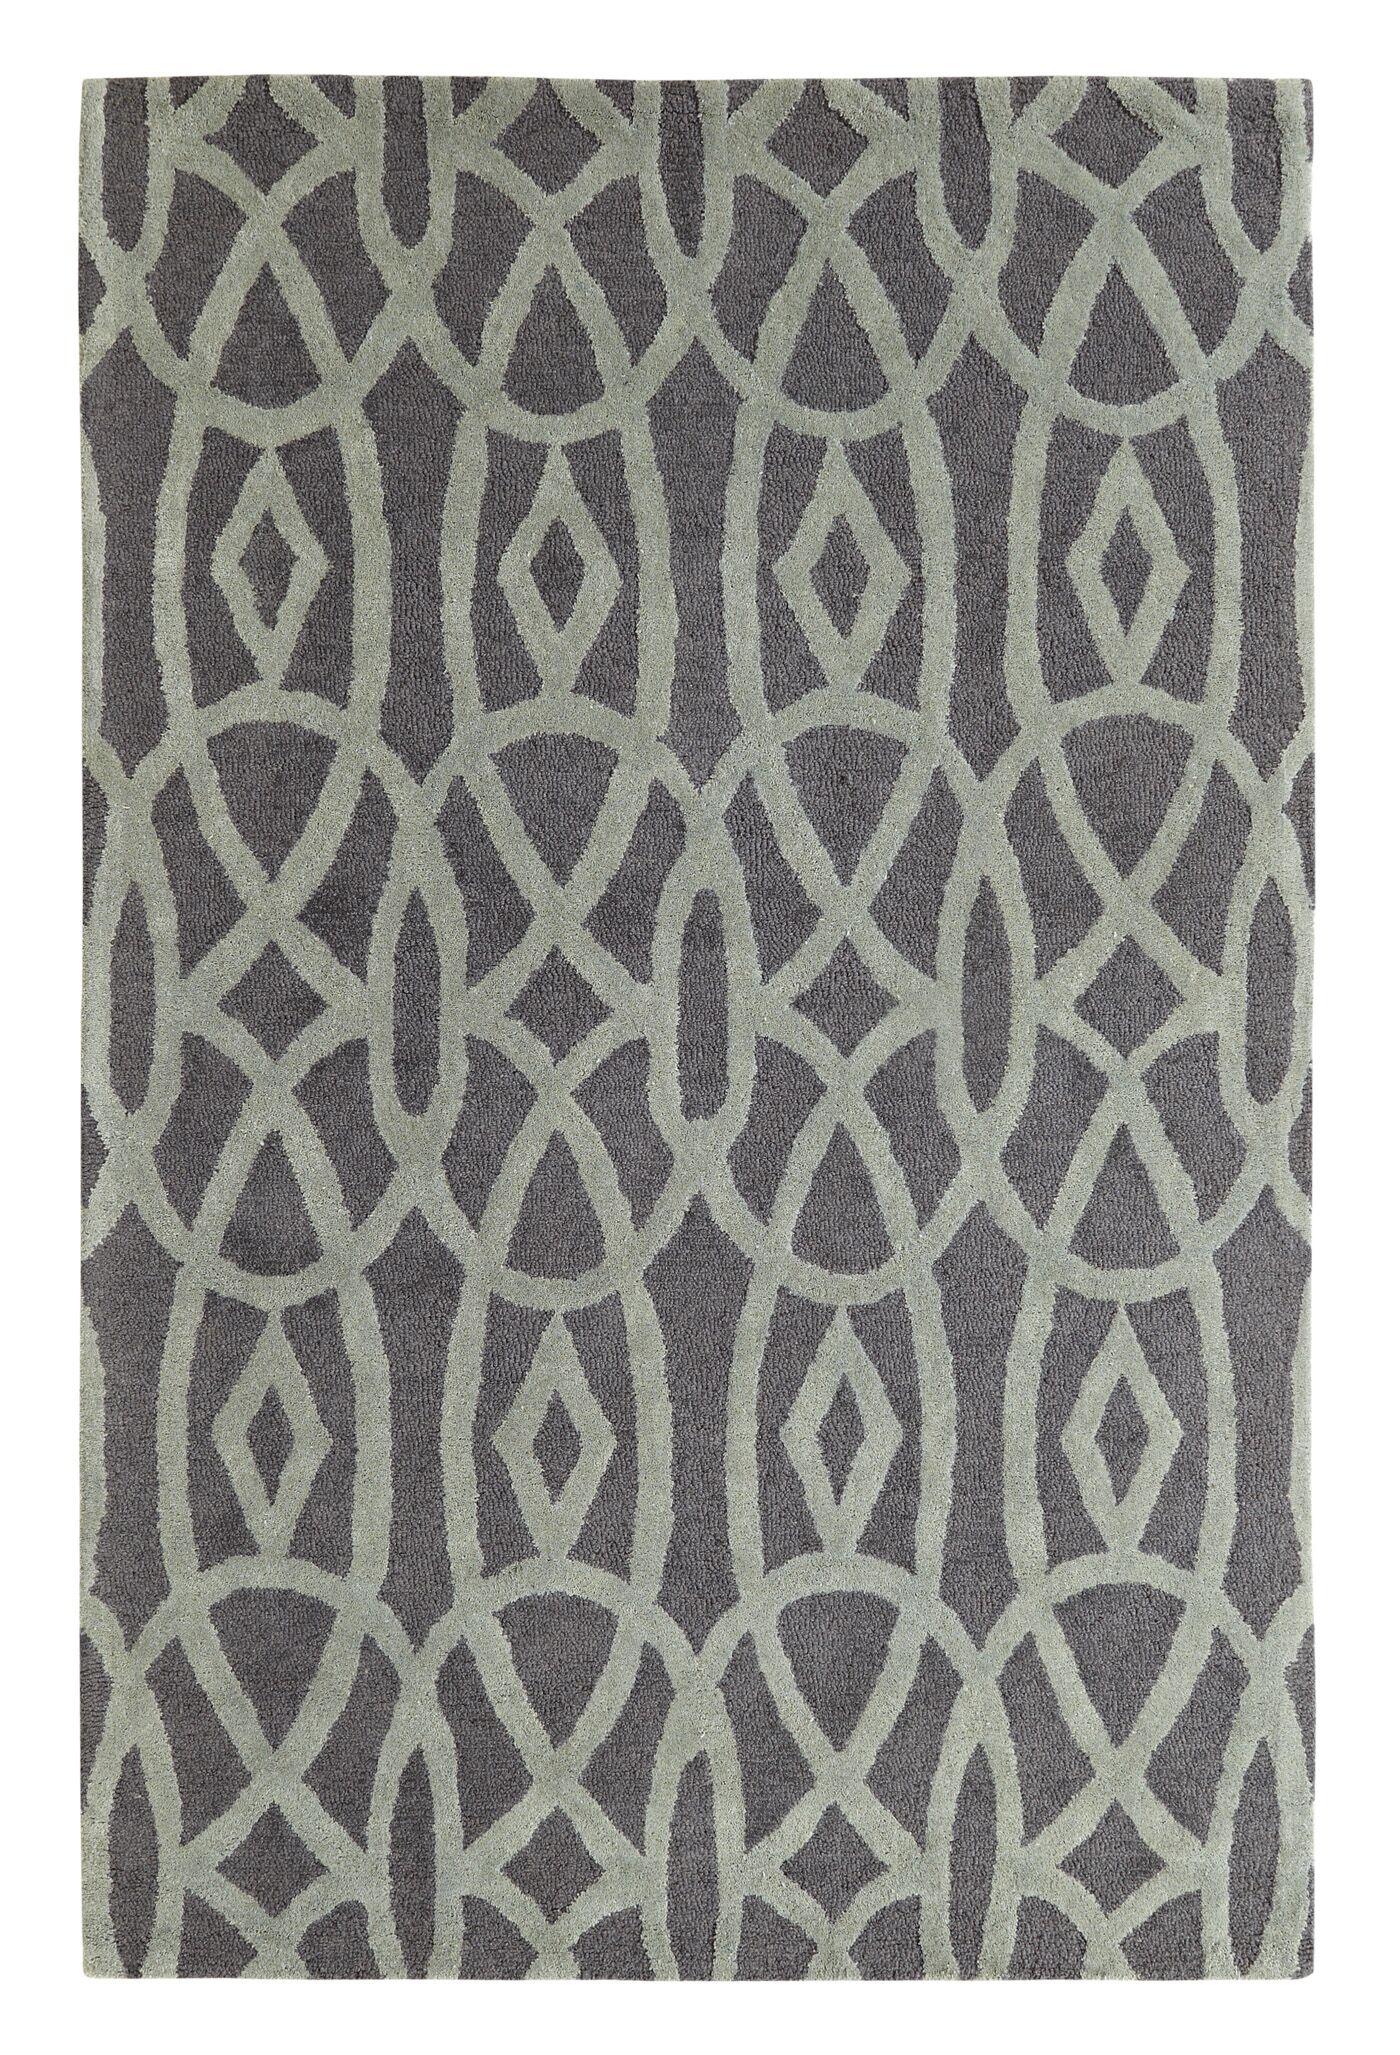 Rentz Black/Grey Area Rug Rug Size: Rectangle 5' x 8'